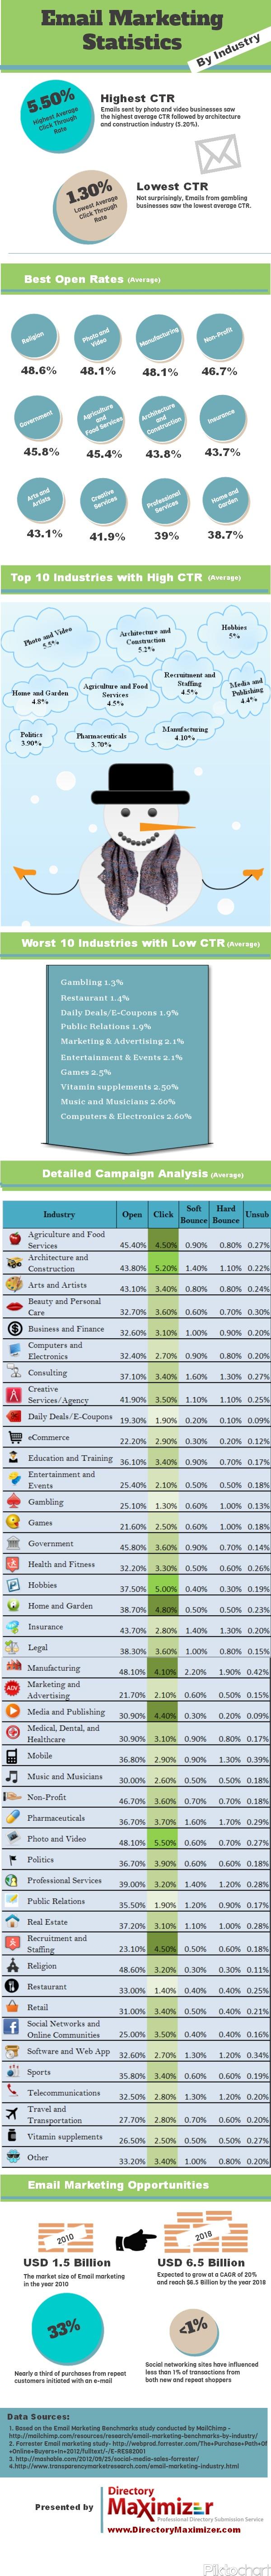 Estadísticas de email marketing por sectores